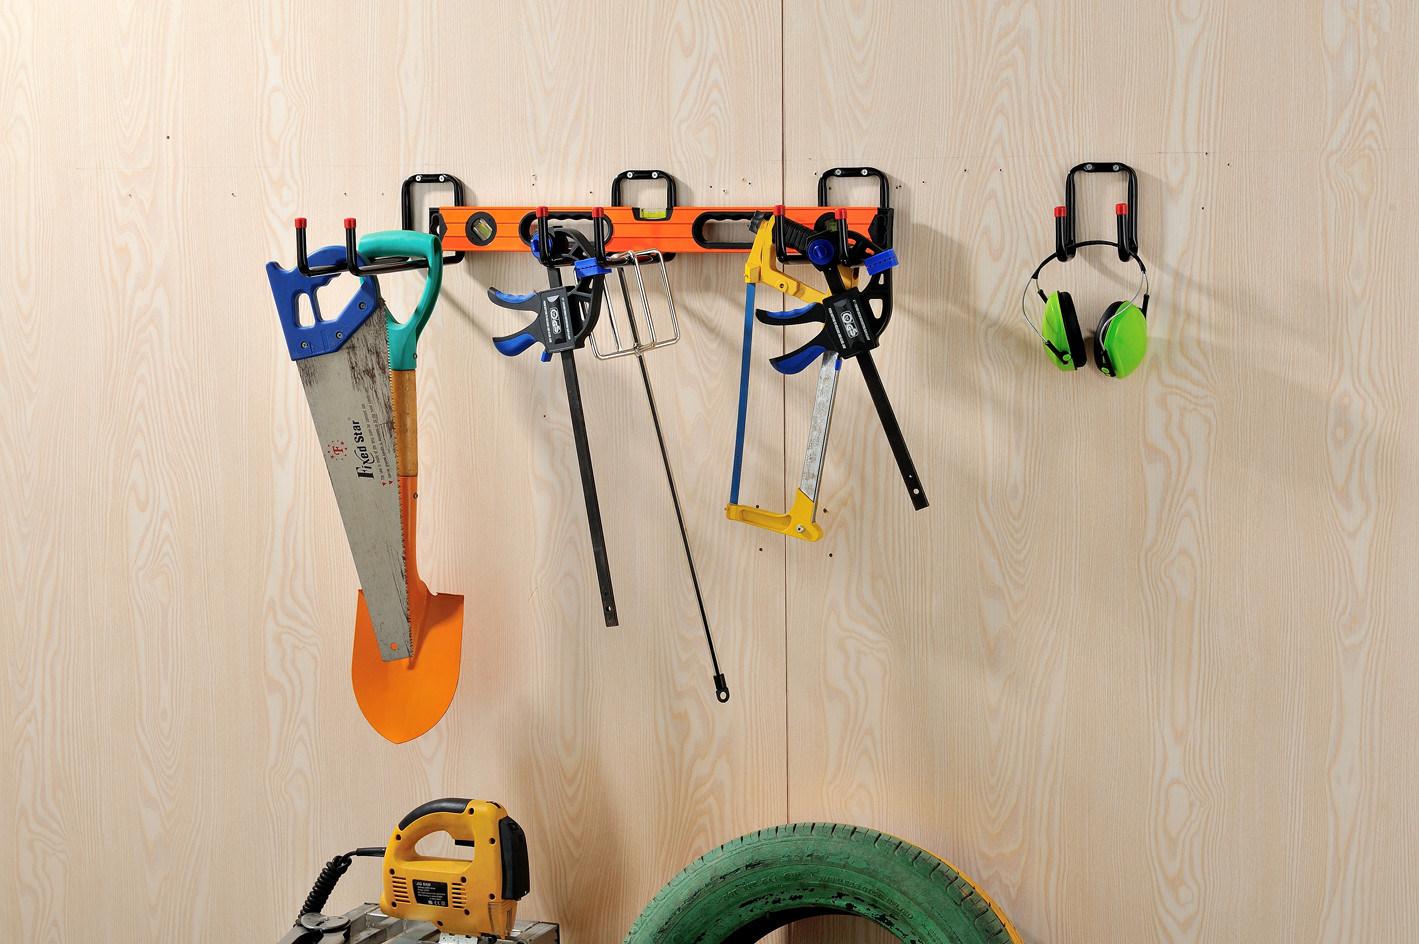 home holder bathroom plant hanger hooks set pot garden item from screw kitchen red garage hanging clothing in towel storage rails